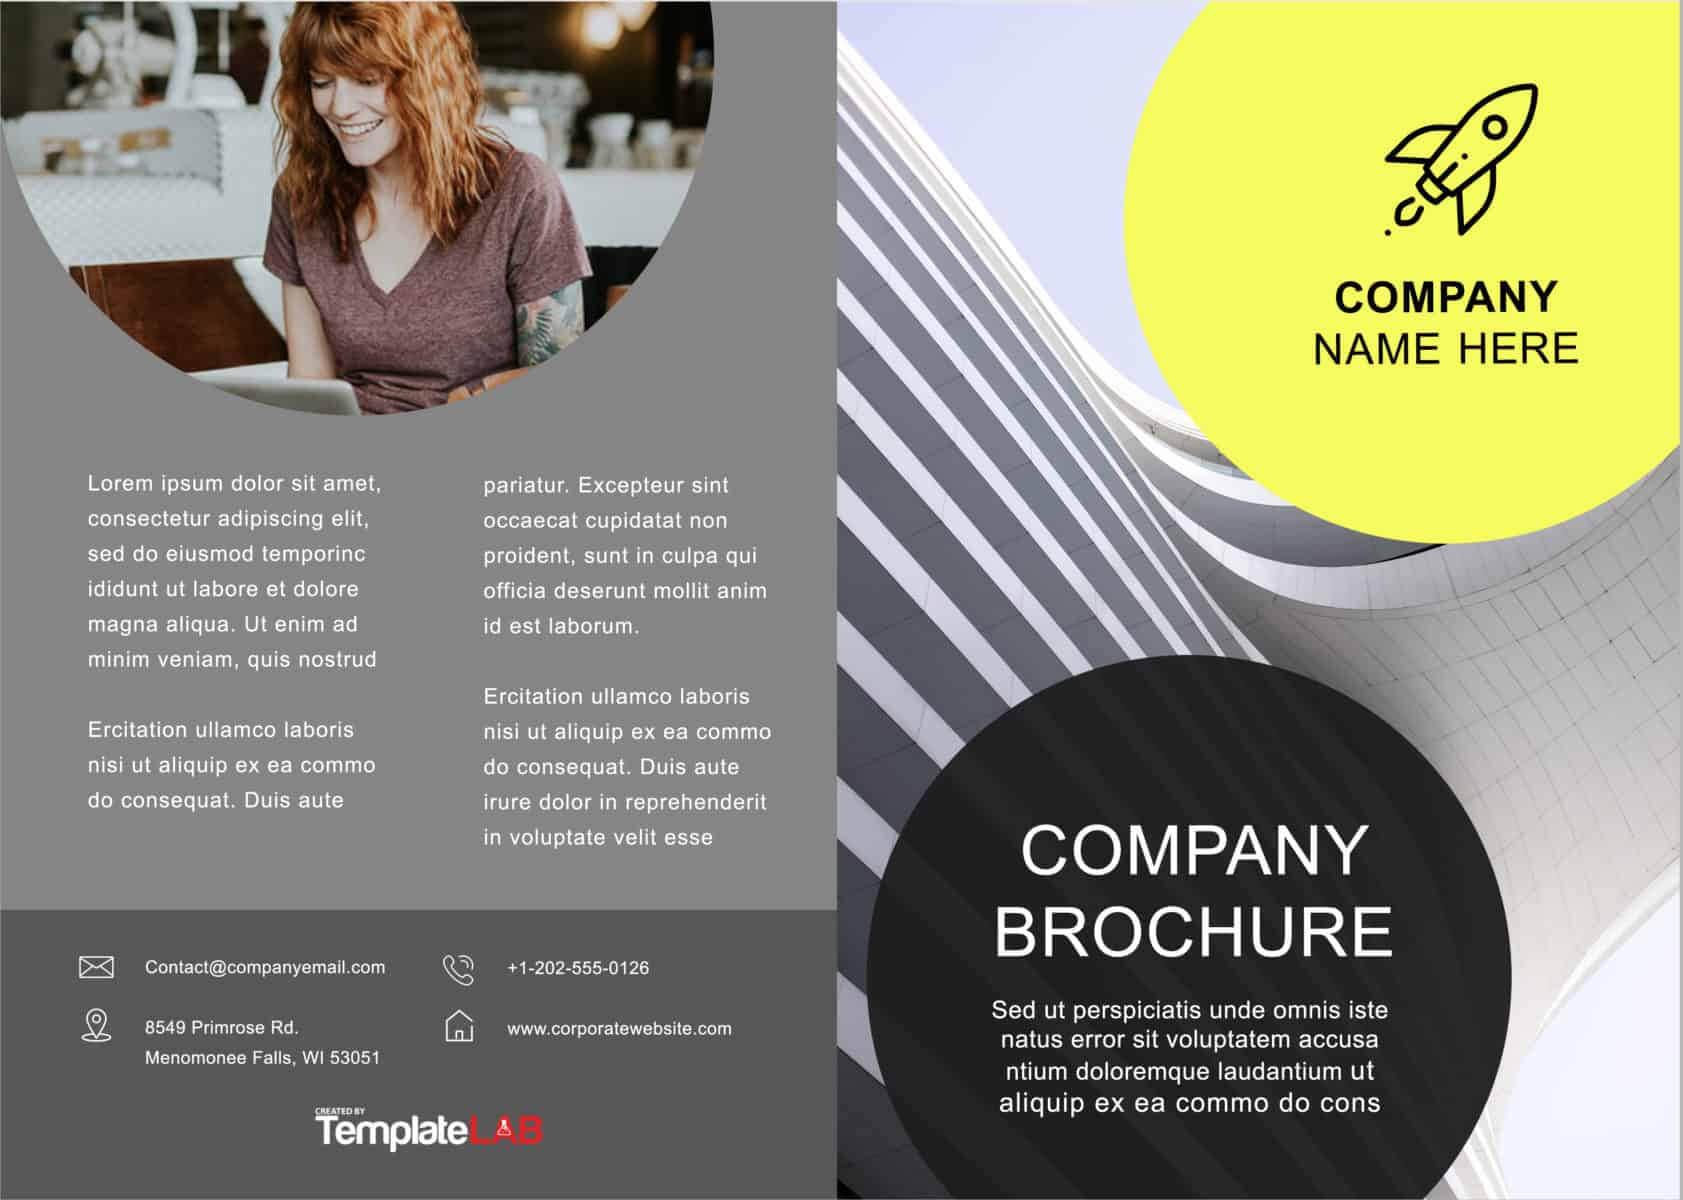 33 Free Brochure Templates (Word + Pdf) ᐅ Template Lab In Creative Brochure Templates Free Download